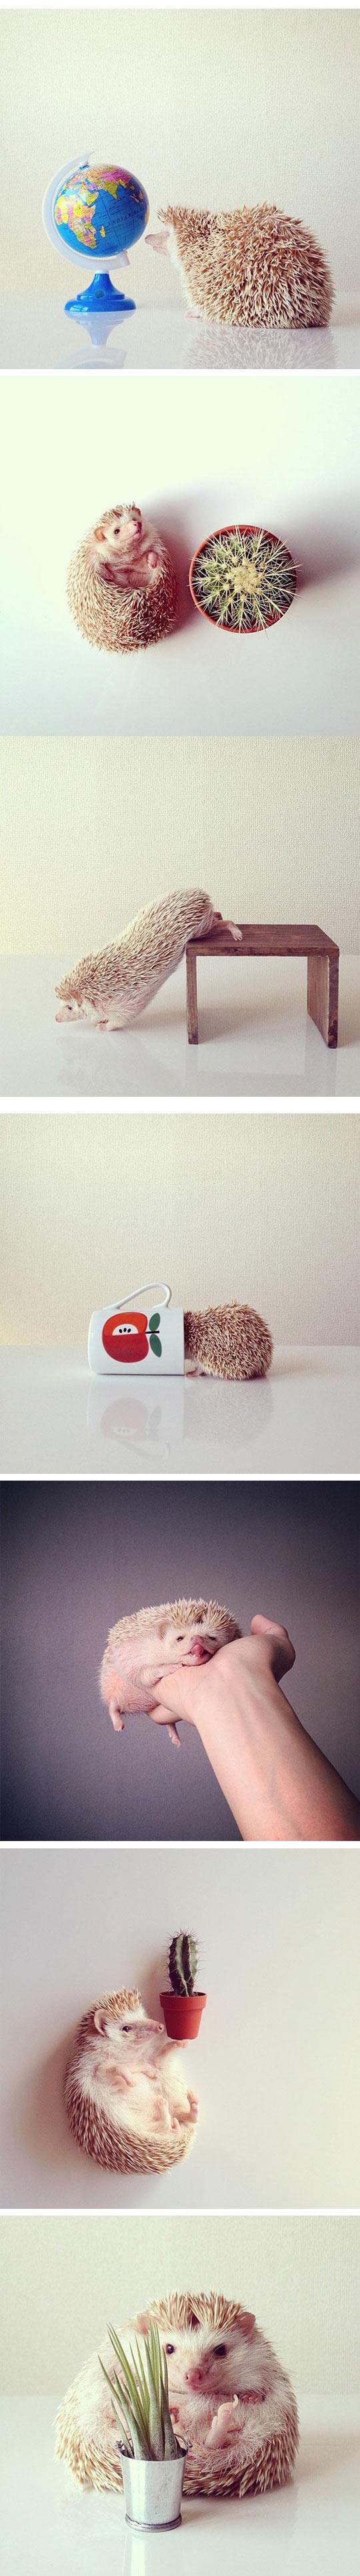 cute-hedgehog-Instagram-pics-hand